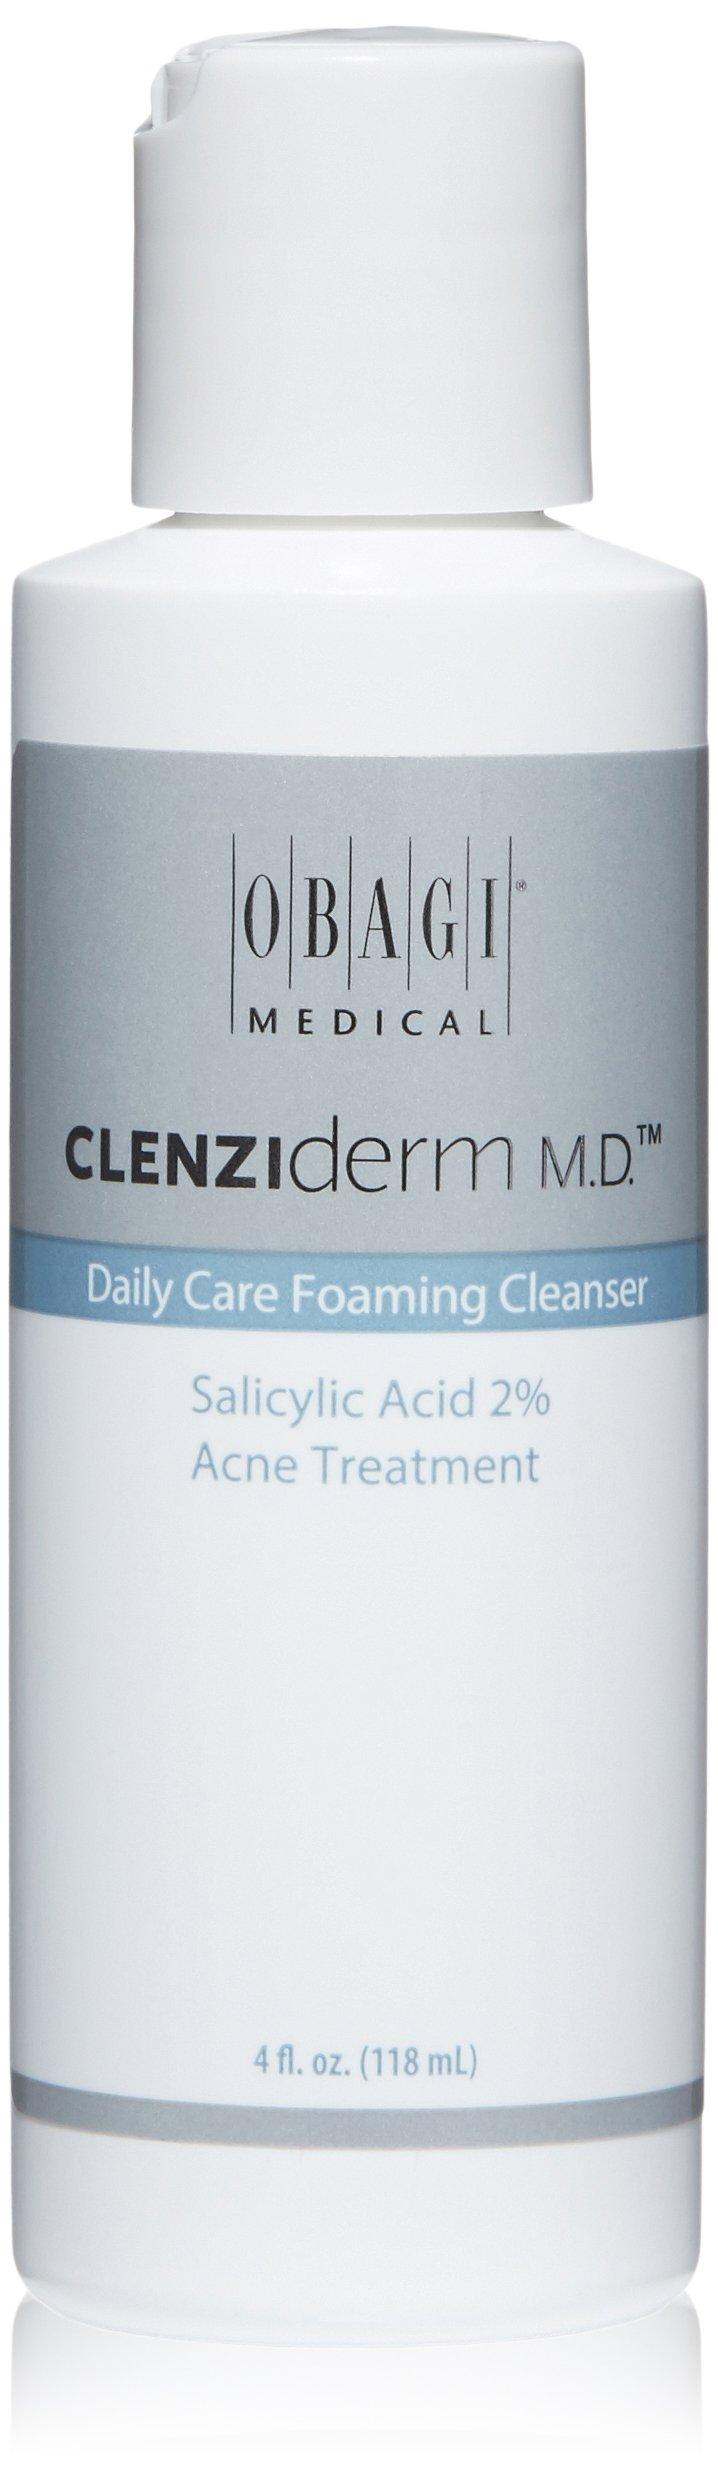 Obagi CLENZIderm M.D. Daily Care Foaming Cleanser Salicylic Acid 2% Acne Treatment, 4 Fl Oz